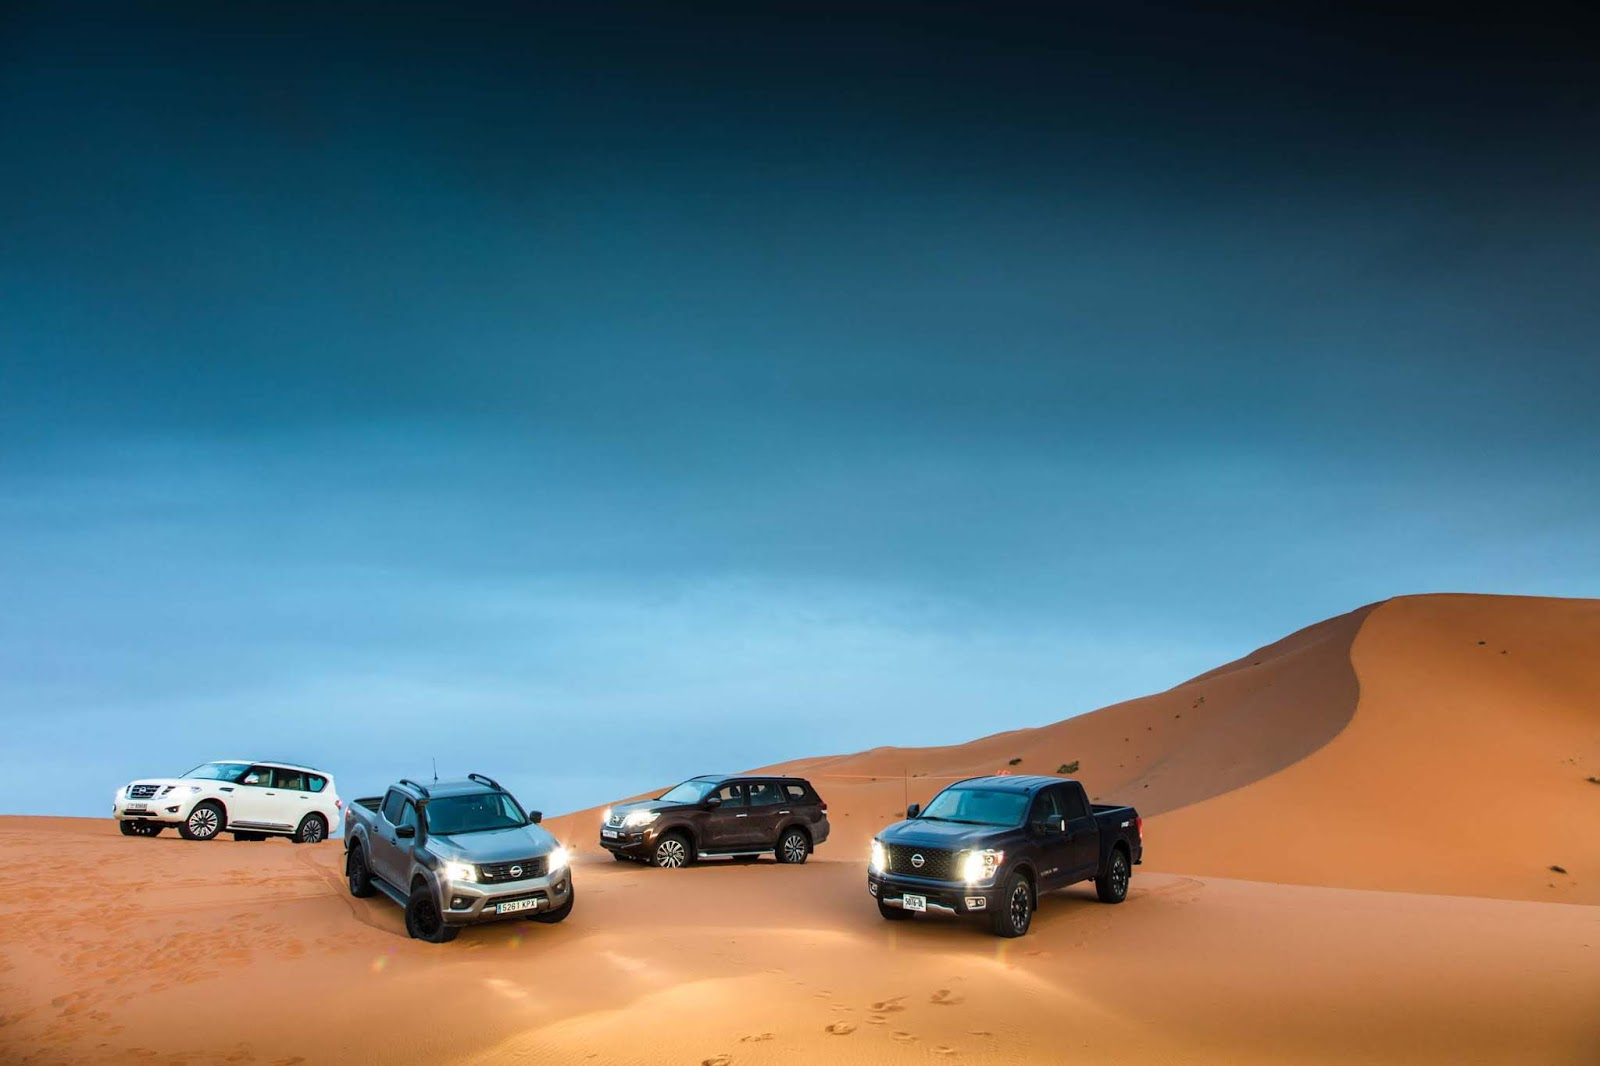 Nissan2BMorocco 2B252822529 Δες τα all terrain οχήματα της Nissan να... δαμάζουν τη Σαχάρα Nissan, Nissan navara, Offroad, video, videos, ΦΩΤΟ